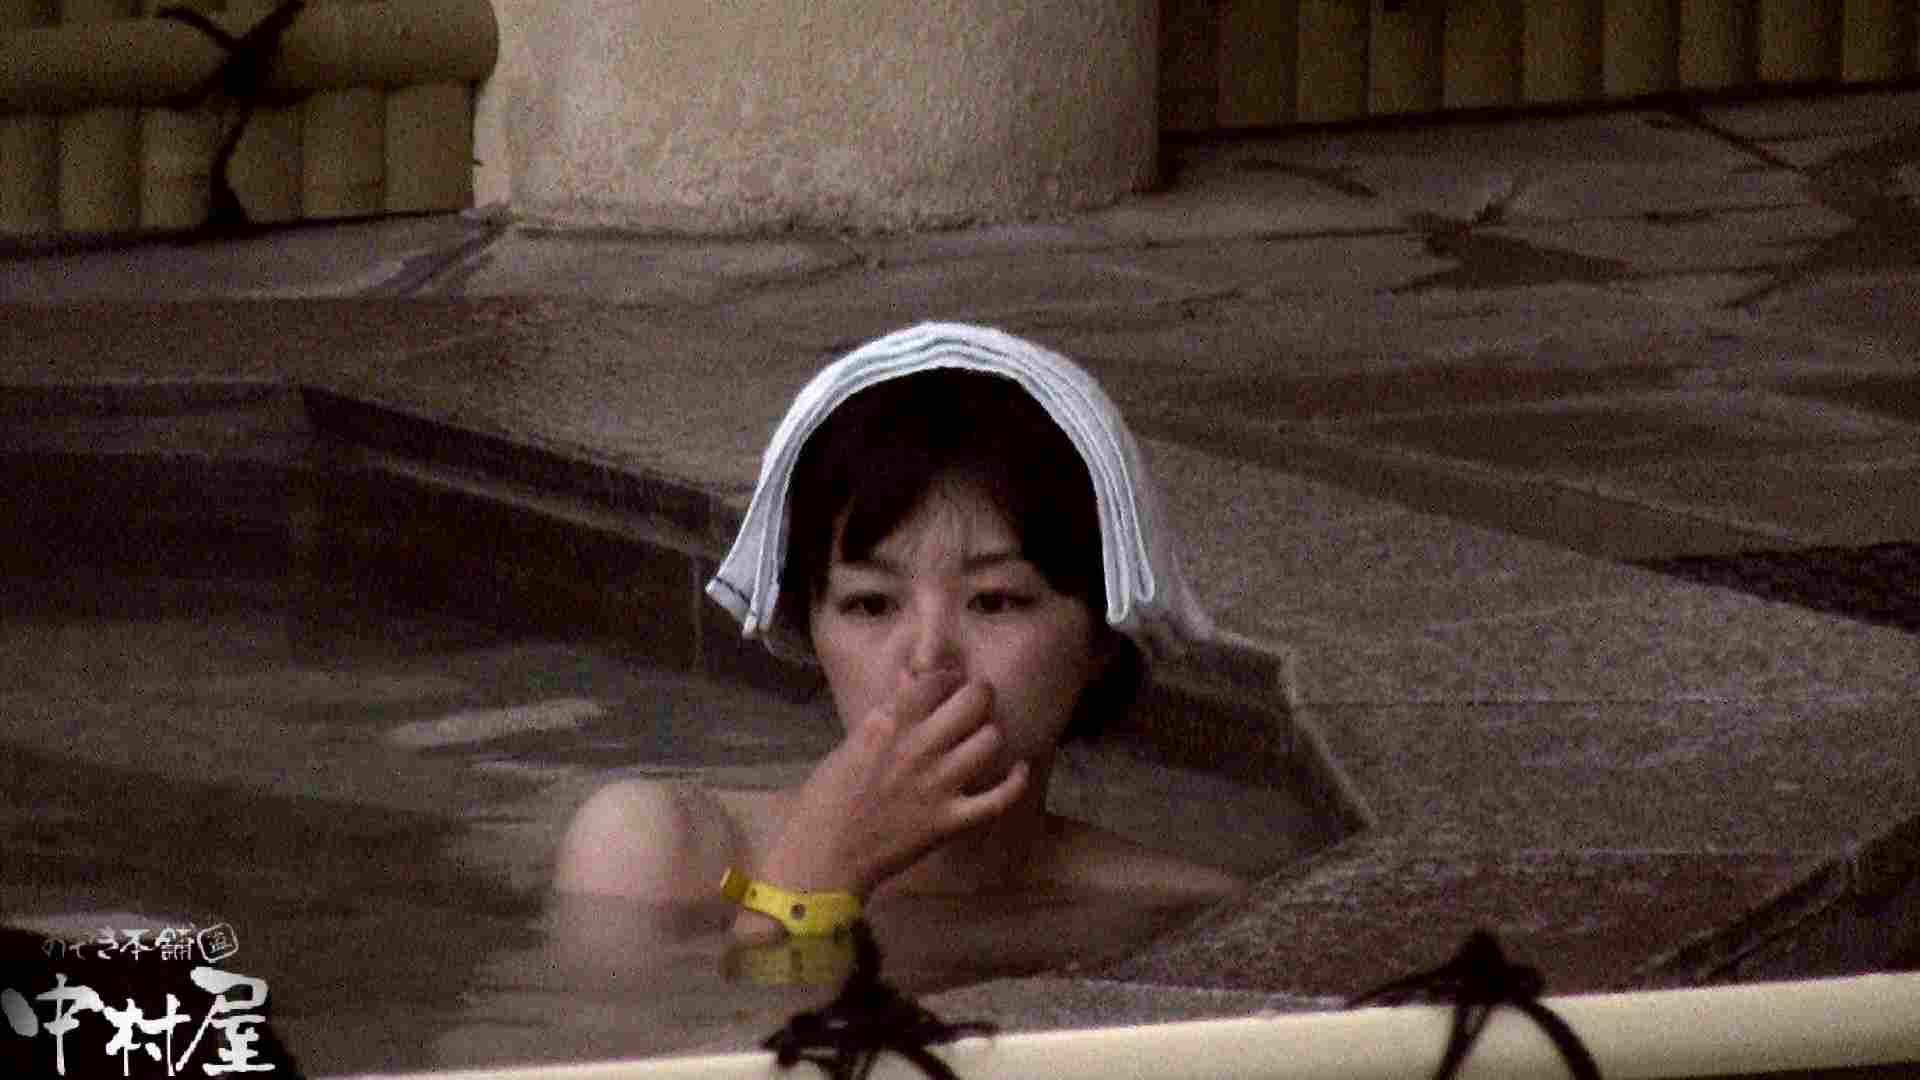 Aquaな露天風呂Vol.916 いやらしいOL  75連発 36